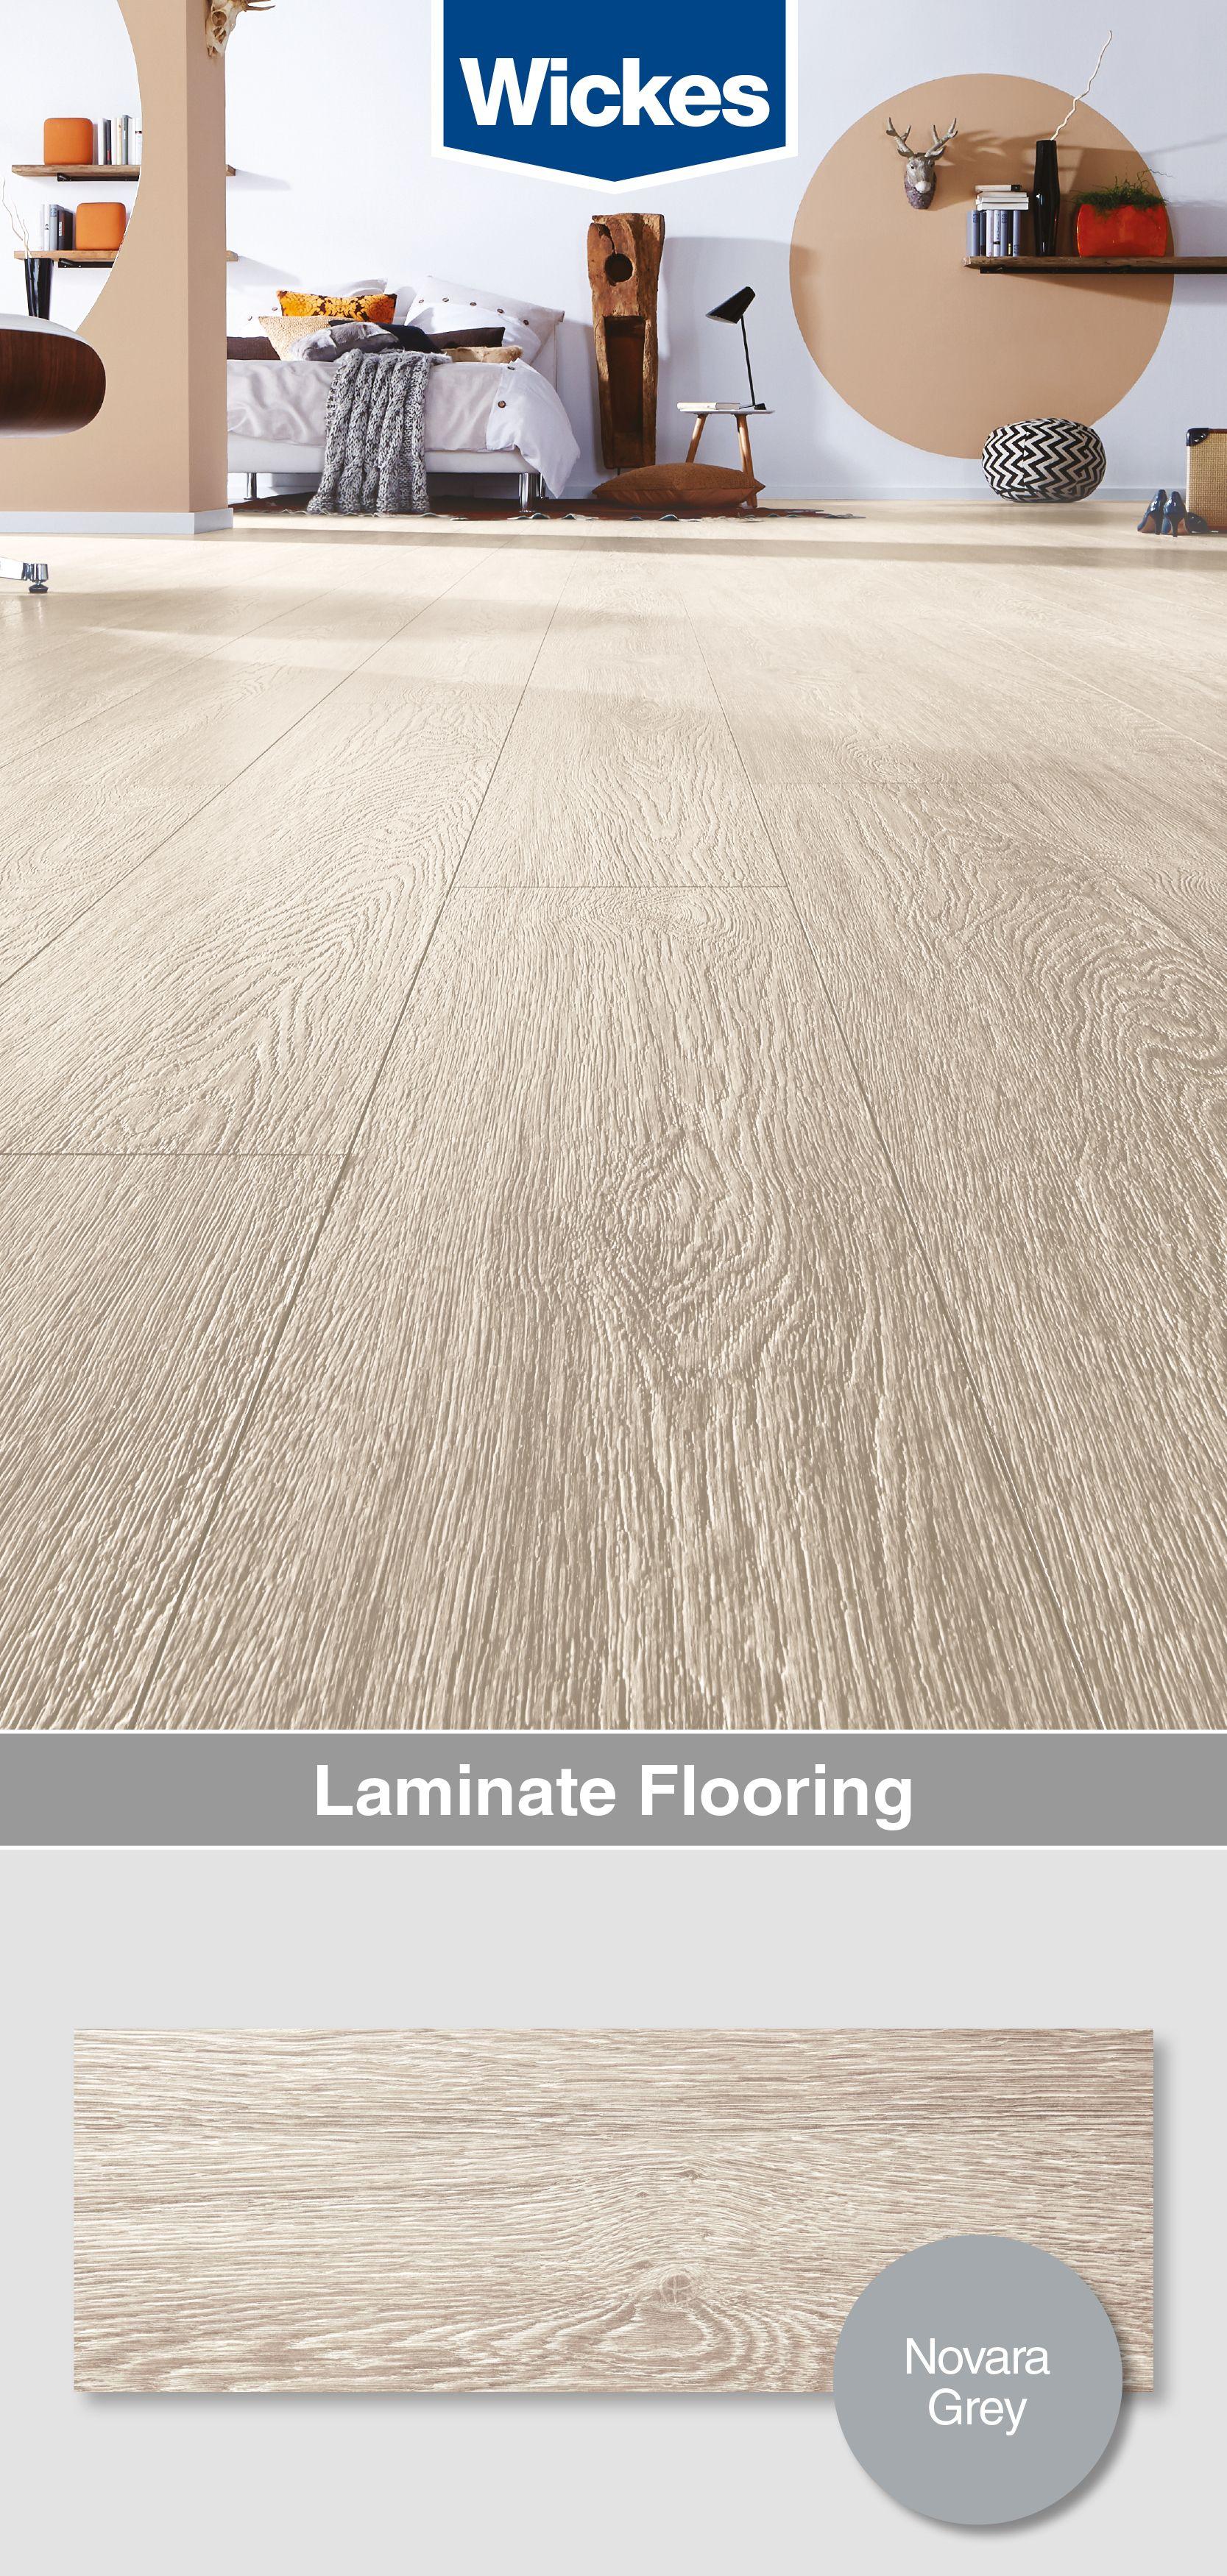 Novara Grey Laminate Flooring Grey Laminate Flooring Grey Laminate Laminate Flooring